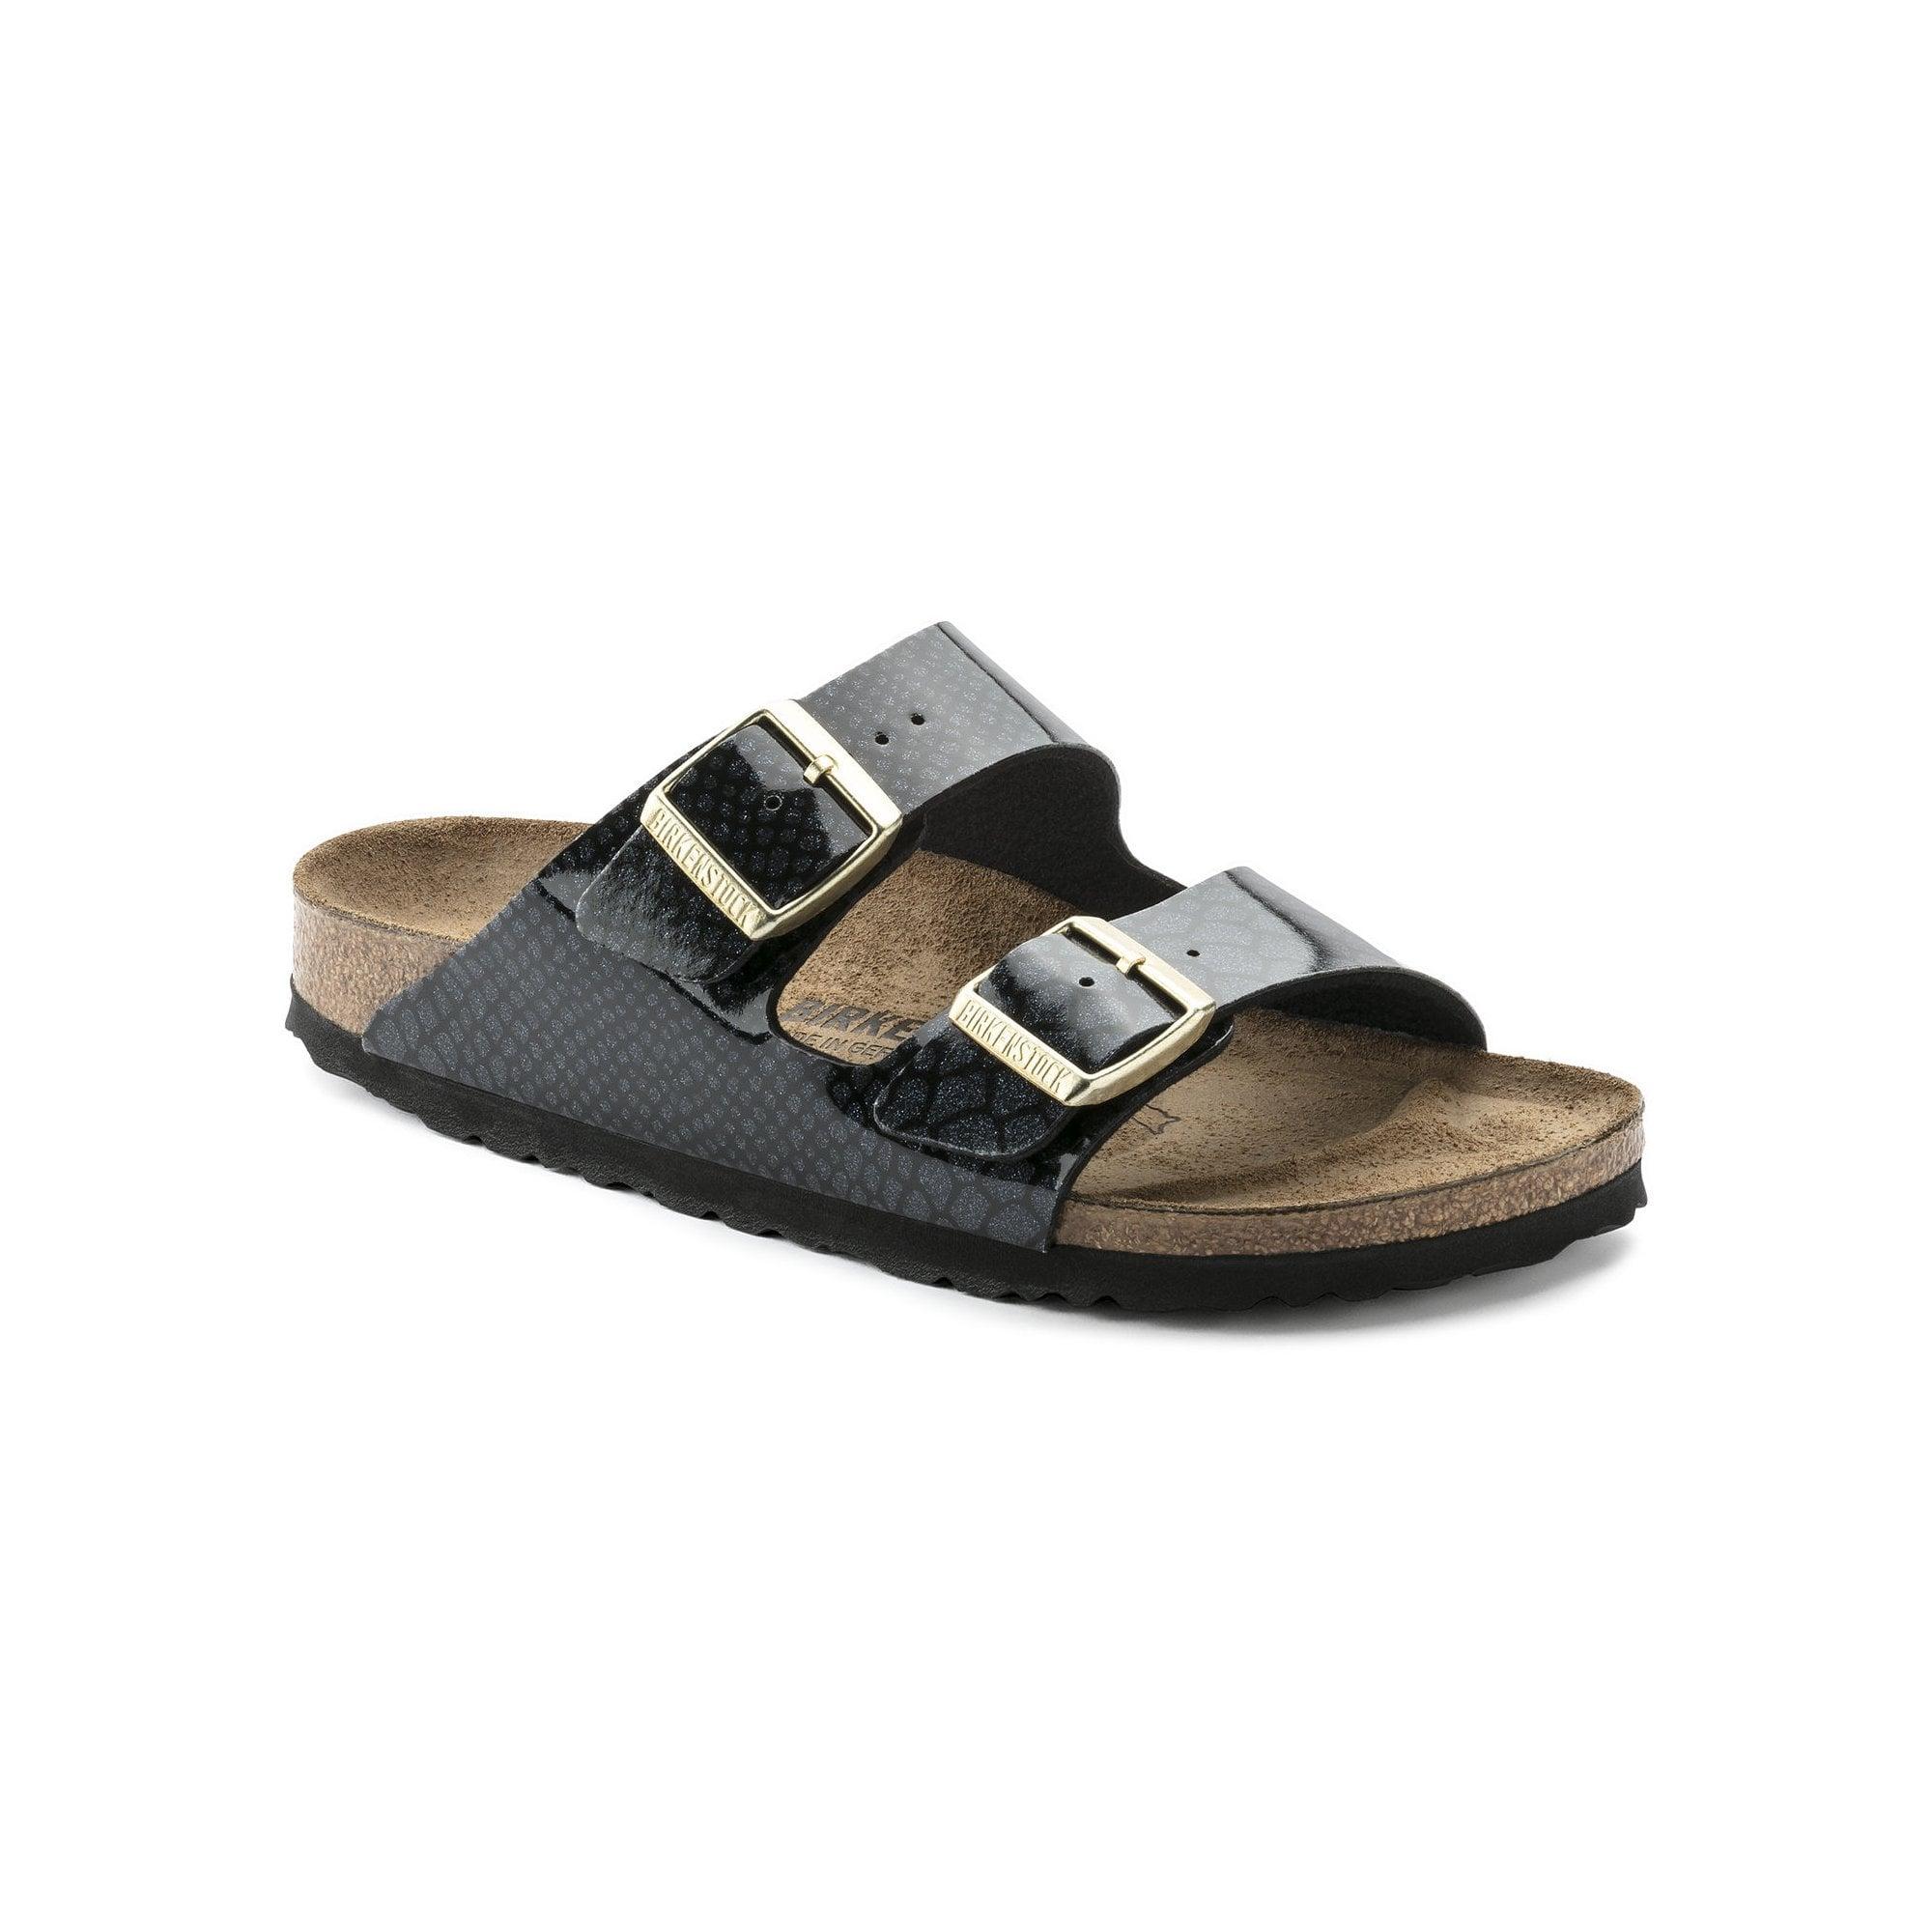 22bf42a2a9c8 Birkenstock Arizona Birko-Flor Sandals In Magic Snake Black